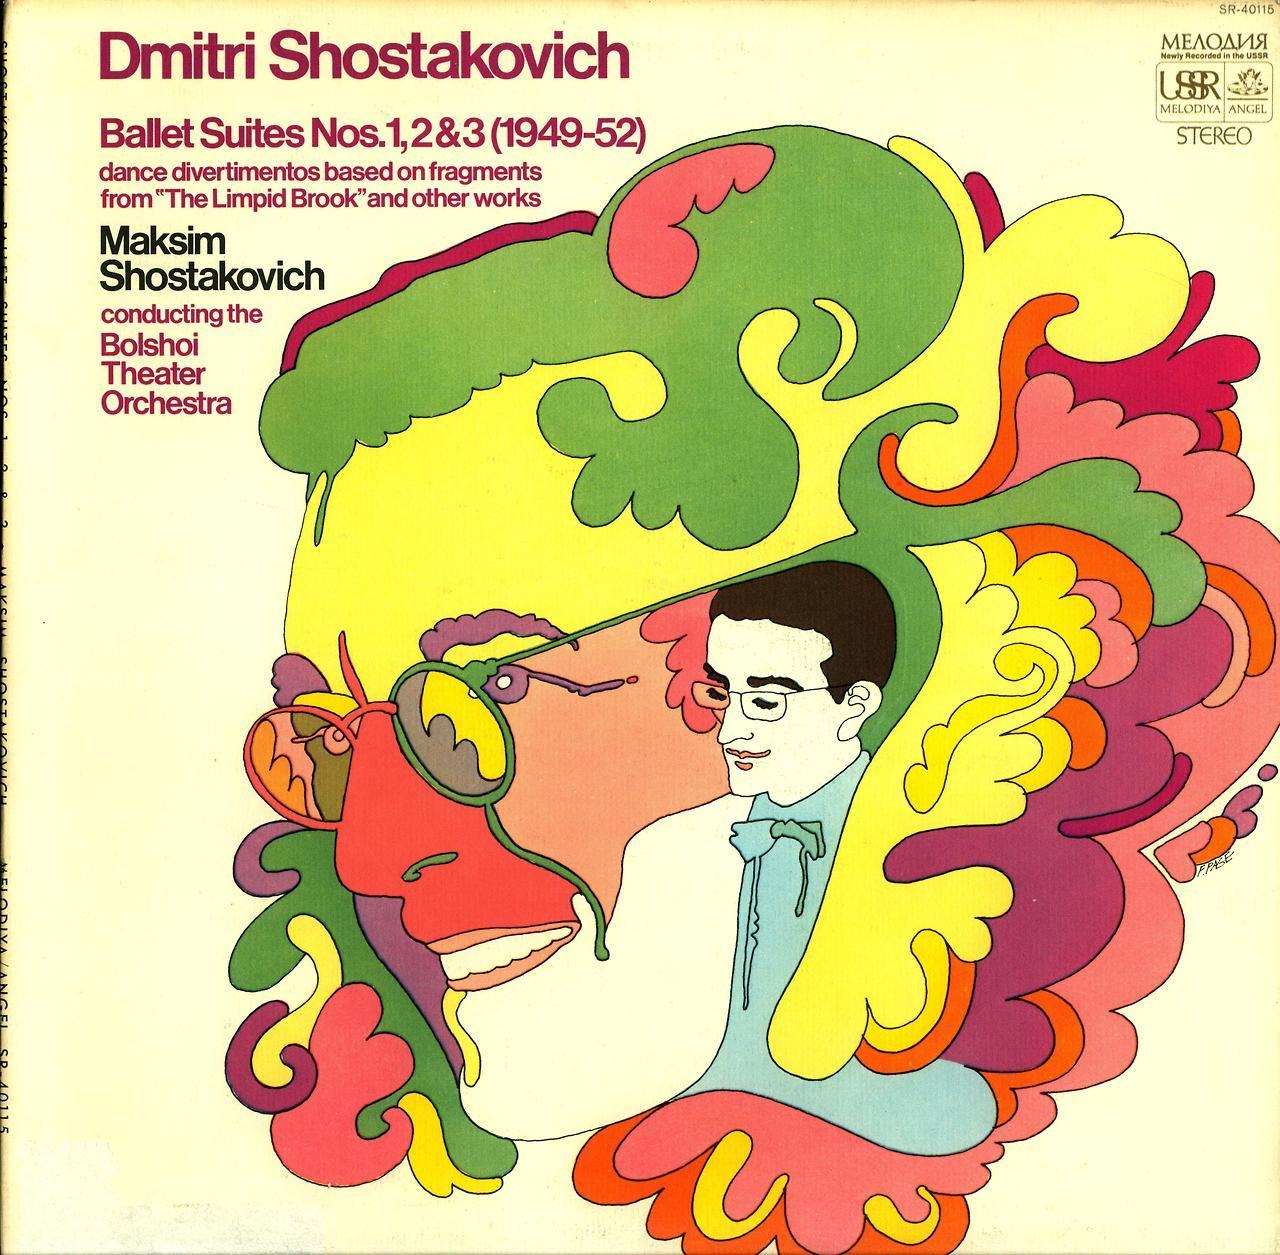 Shostakovich- Ballet Suites Nos. 1, 2, & 3 (1949-52) Bolshoi Theater Orchestra Maksim Shostakovich, conductor